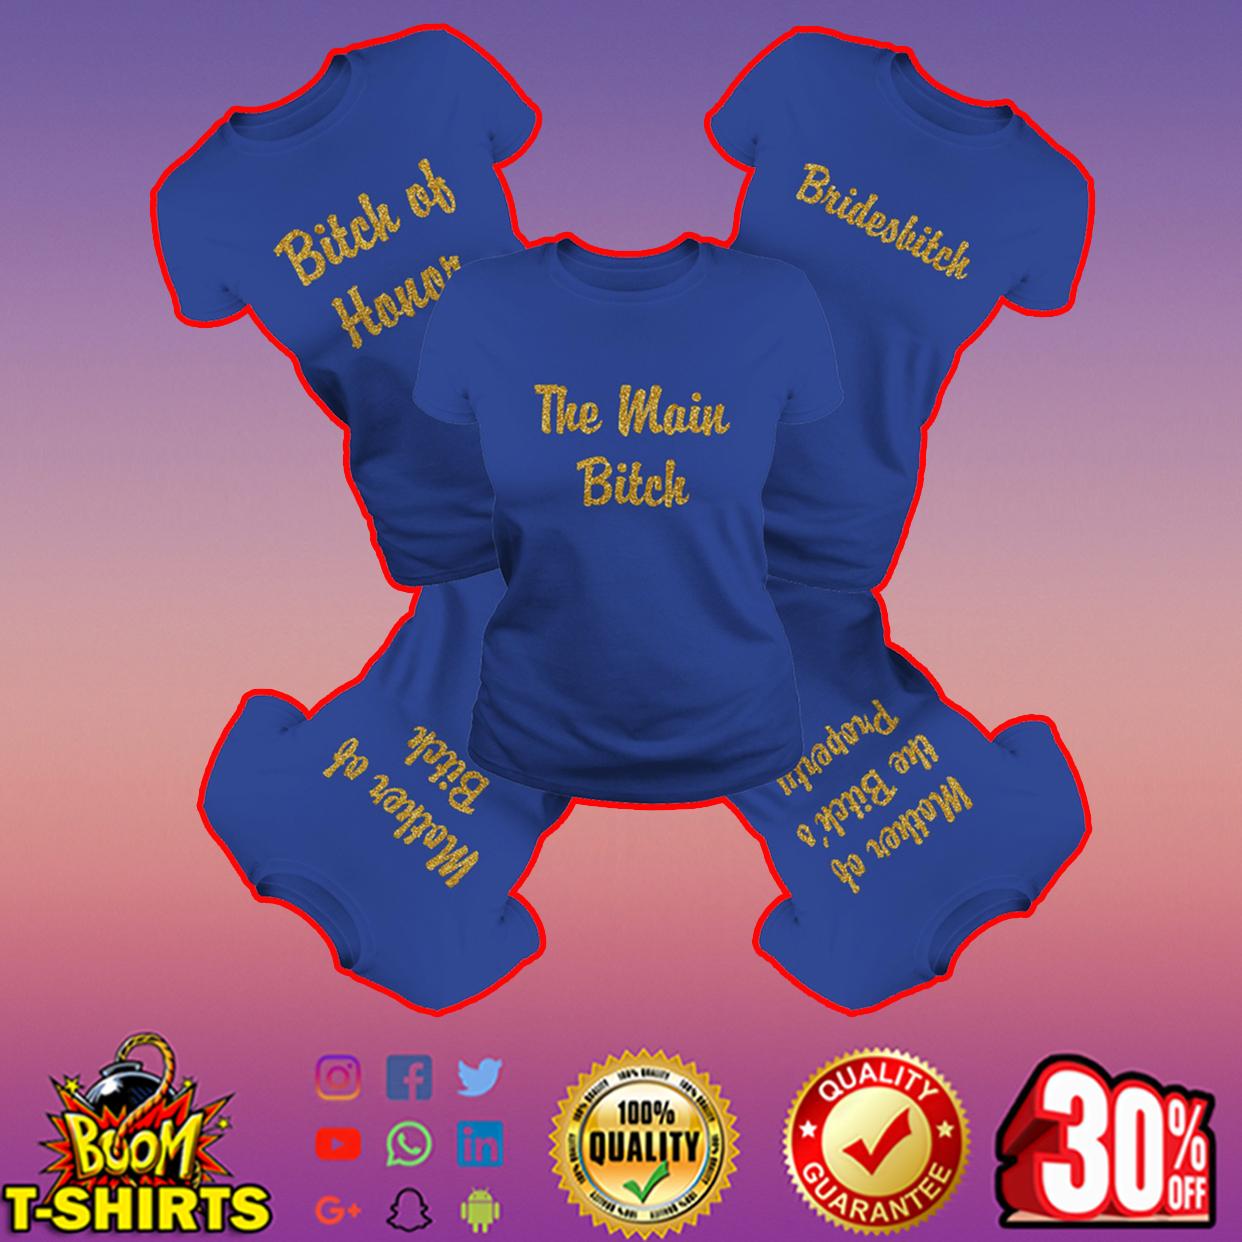 The main bitch - Mother of Bitch royalblue shirt